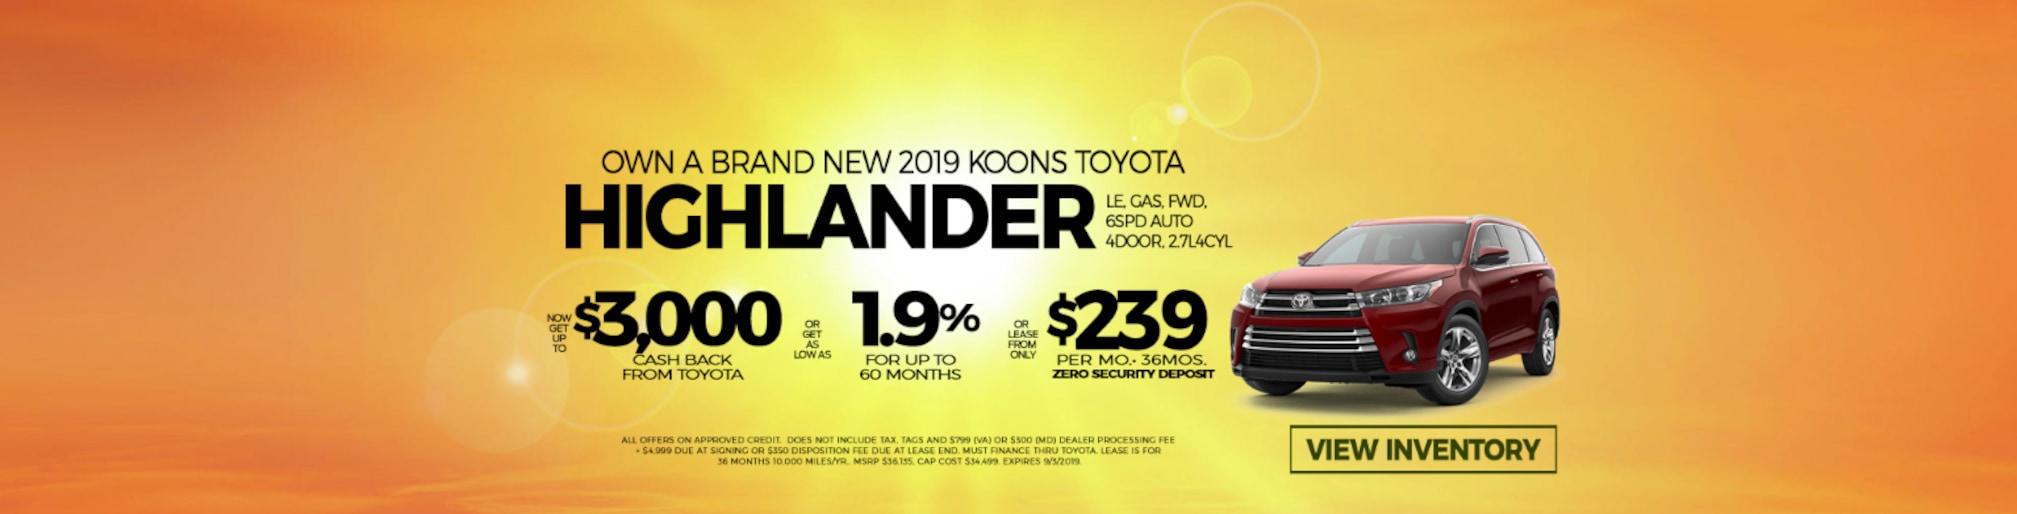 Toyota Dealers In Delaware >> Koons Easton Toyota Toyota Dealership In Easton Serving Maryland